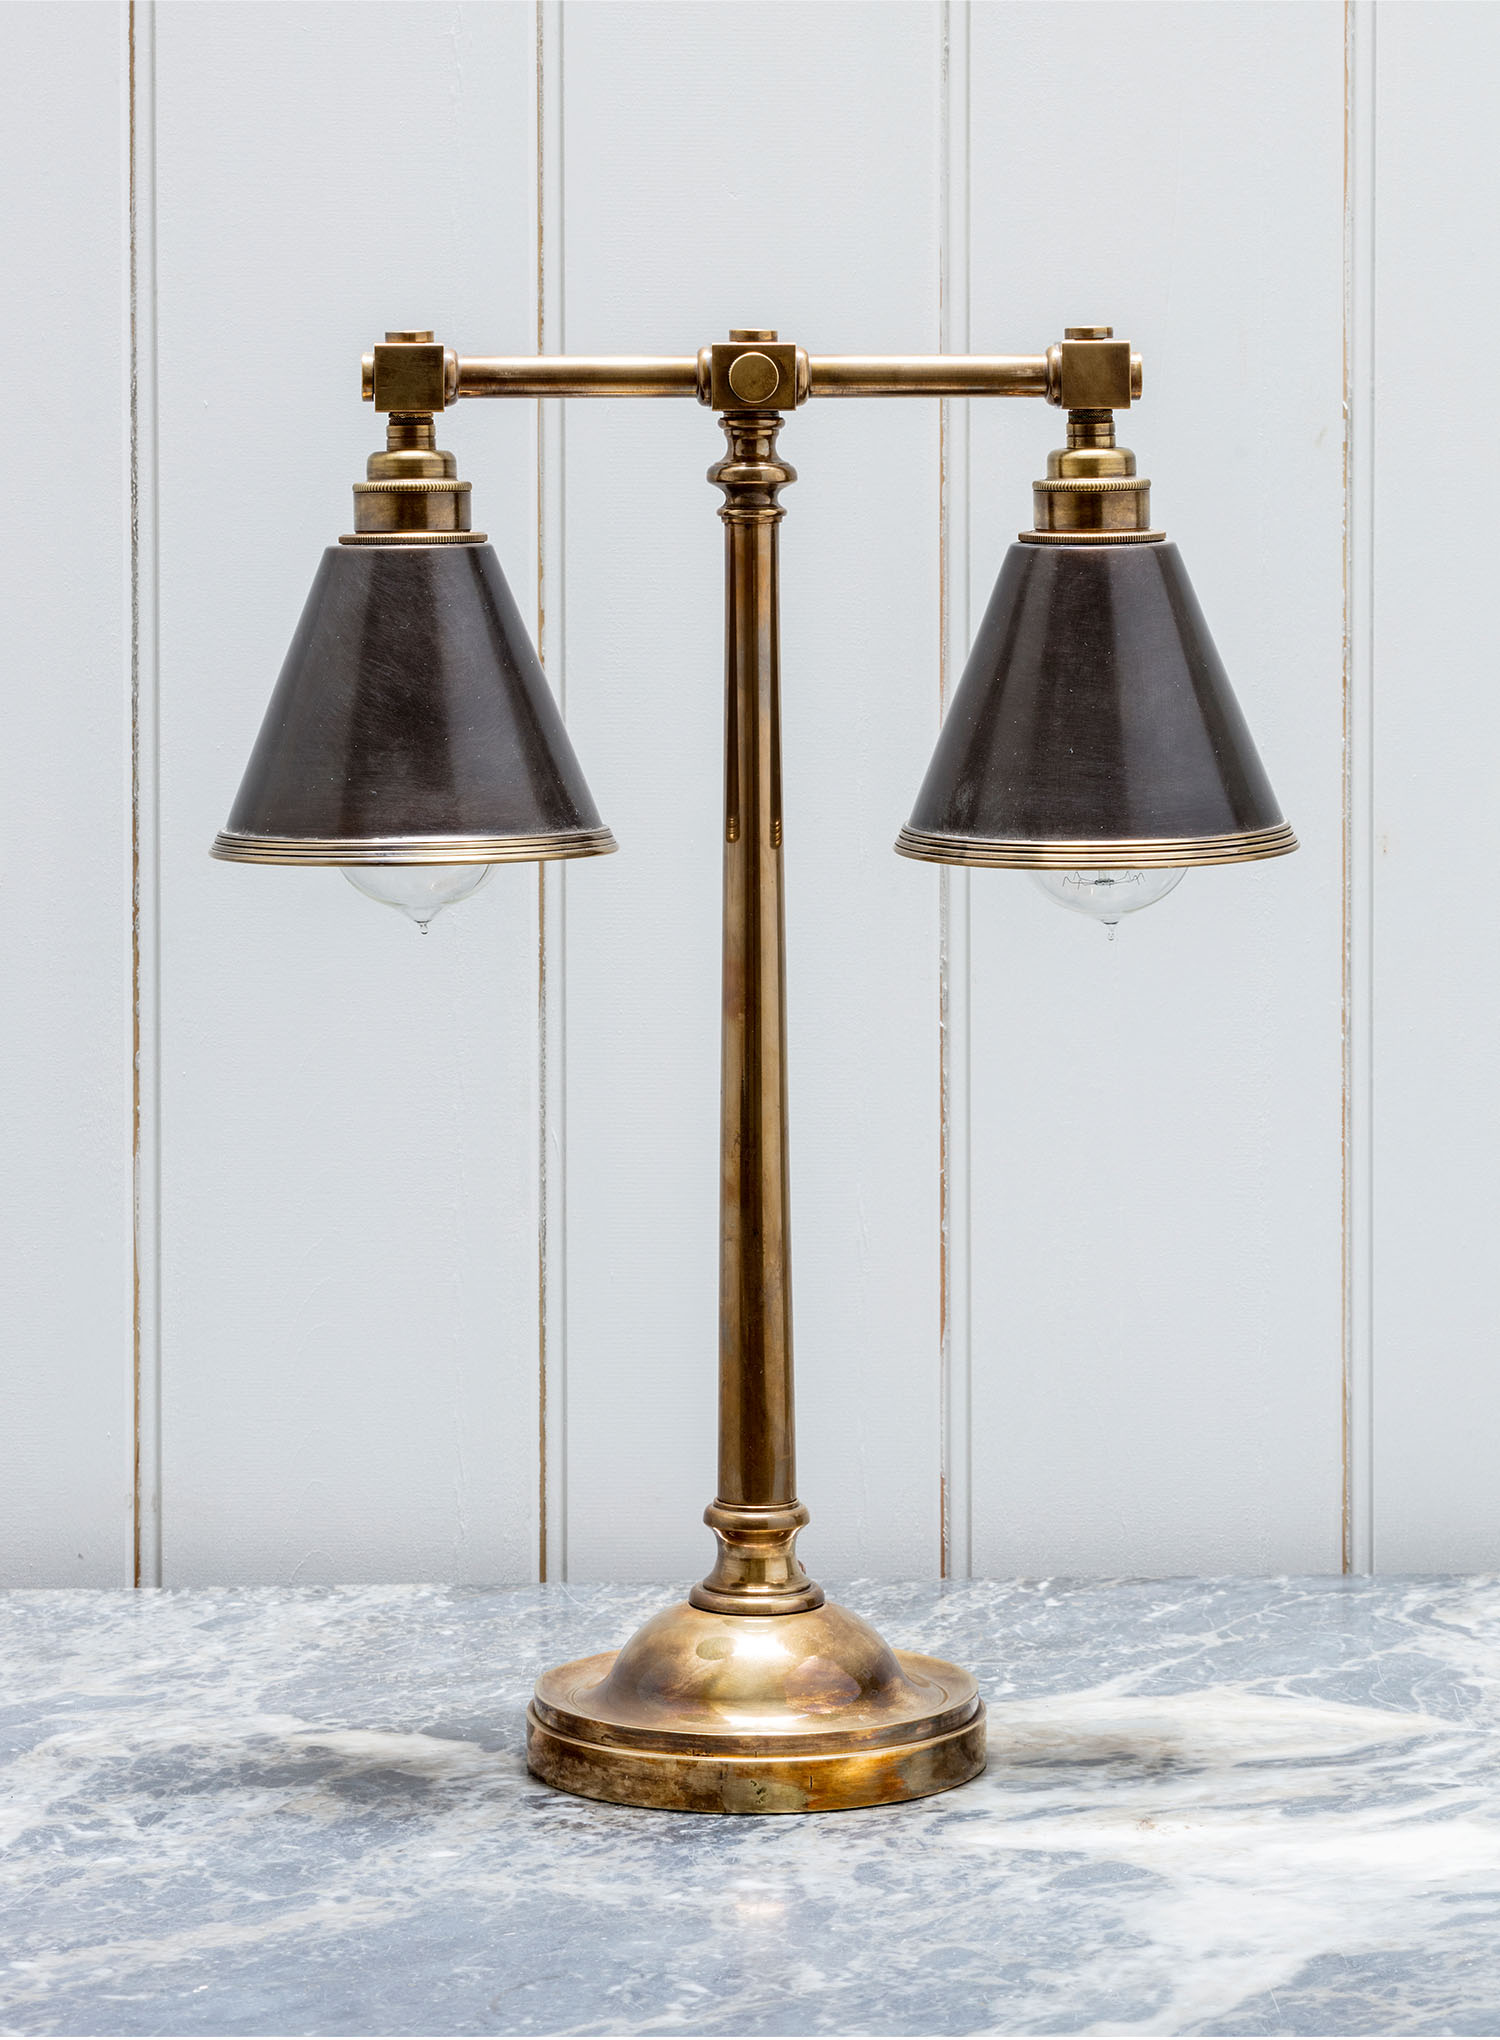 Lighting Metal Table Lamp in Antique